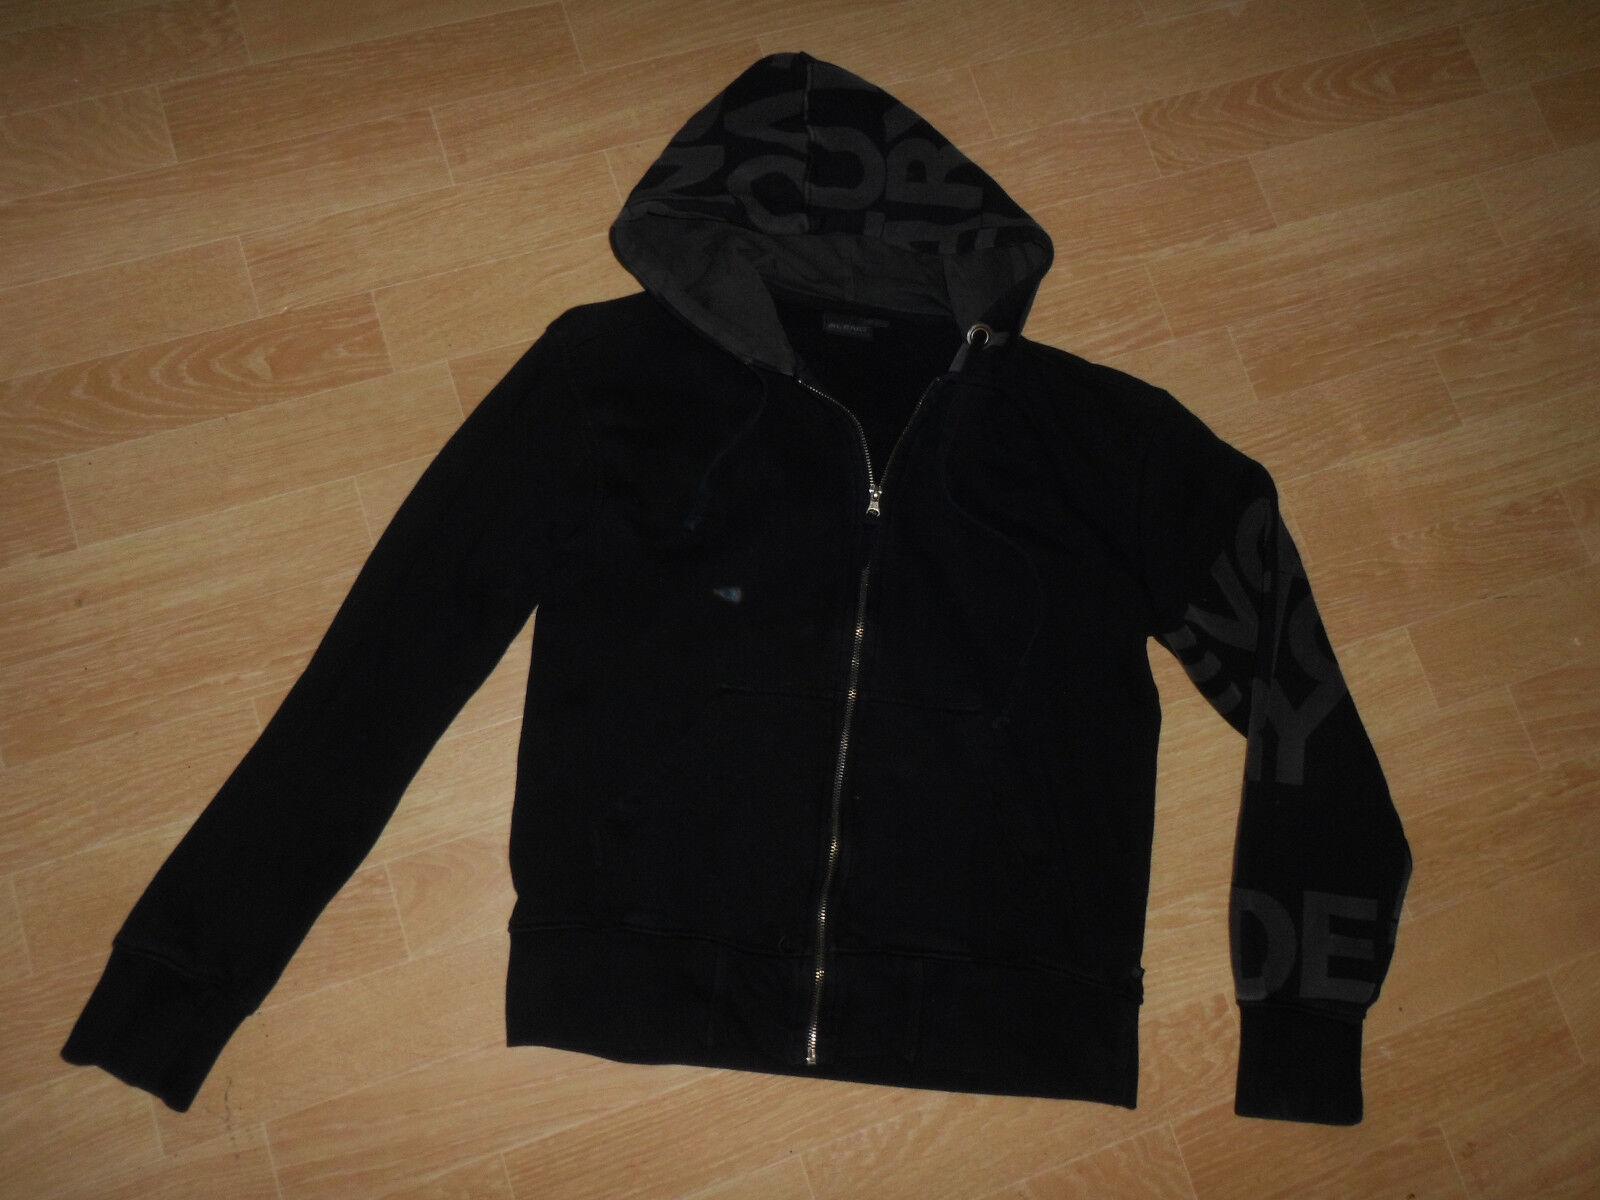 Sweat Jacket Jacket Size M Blend